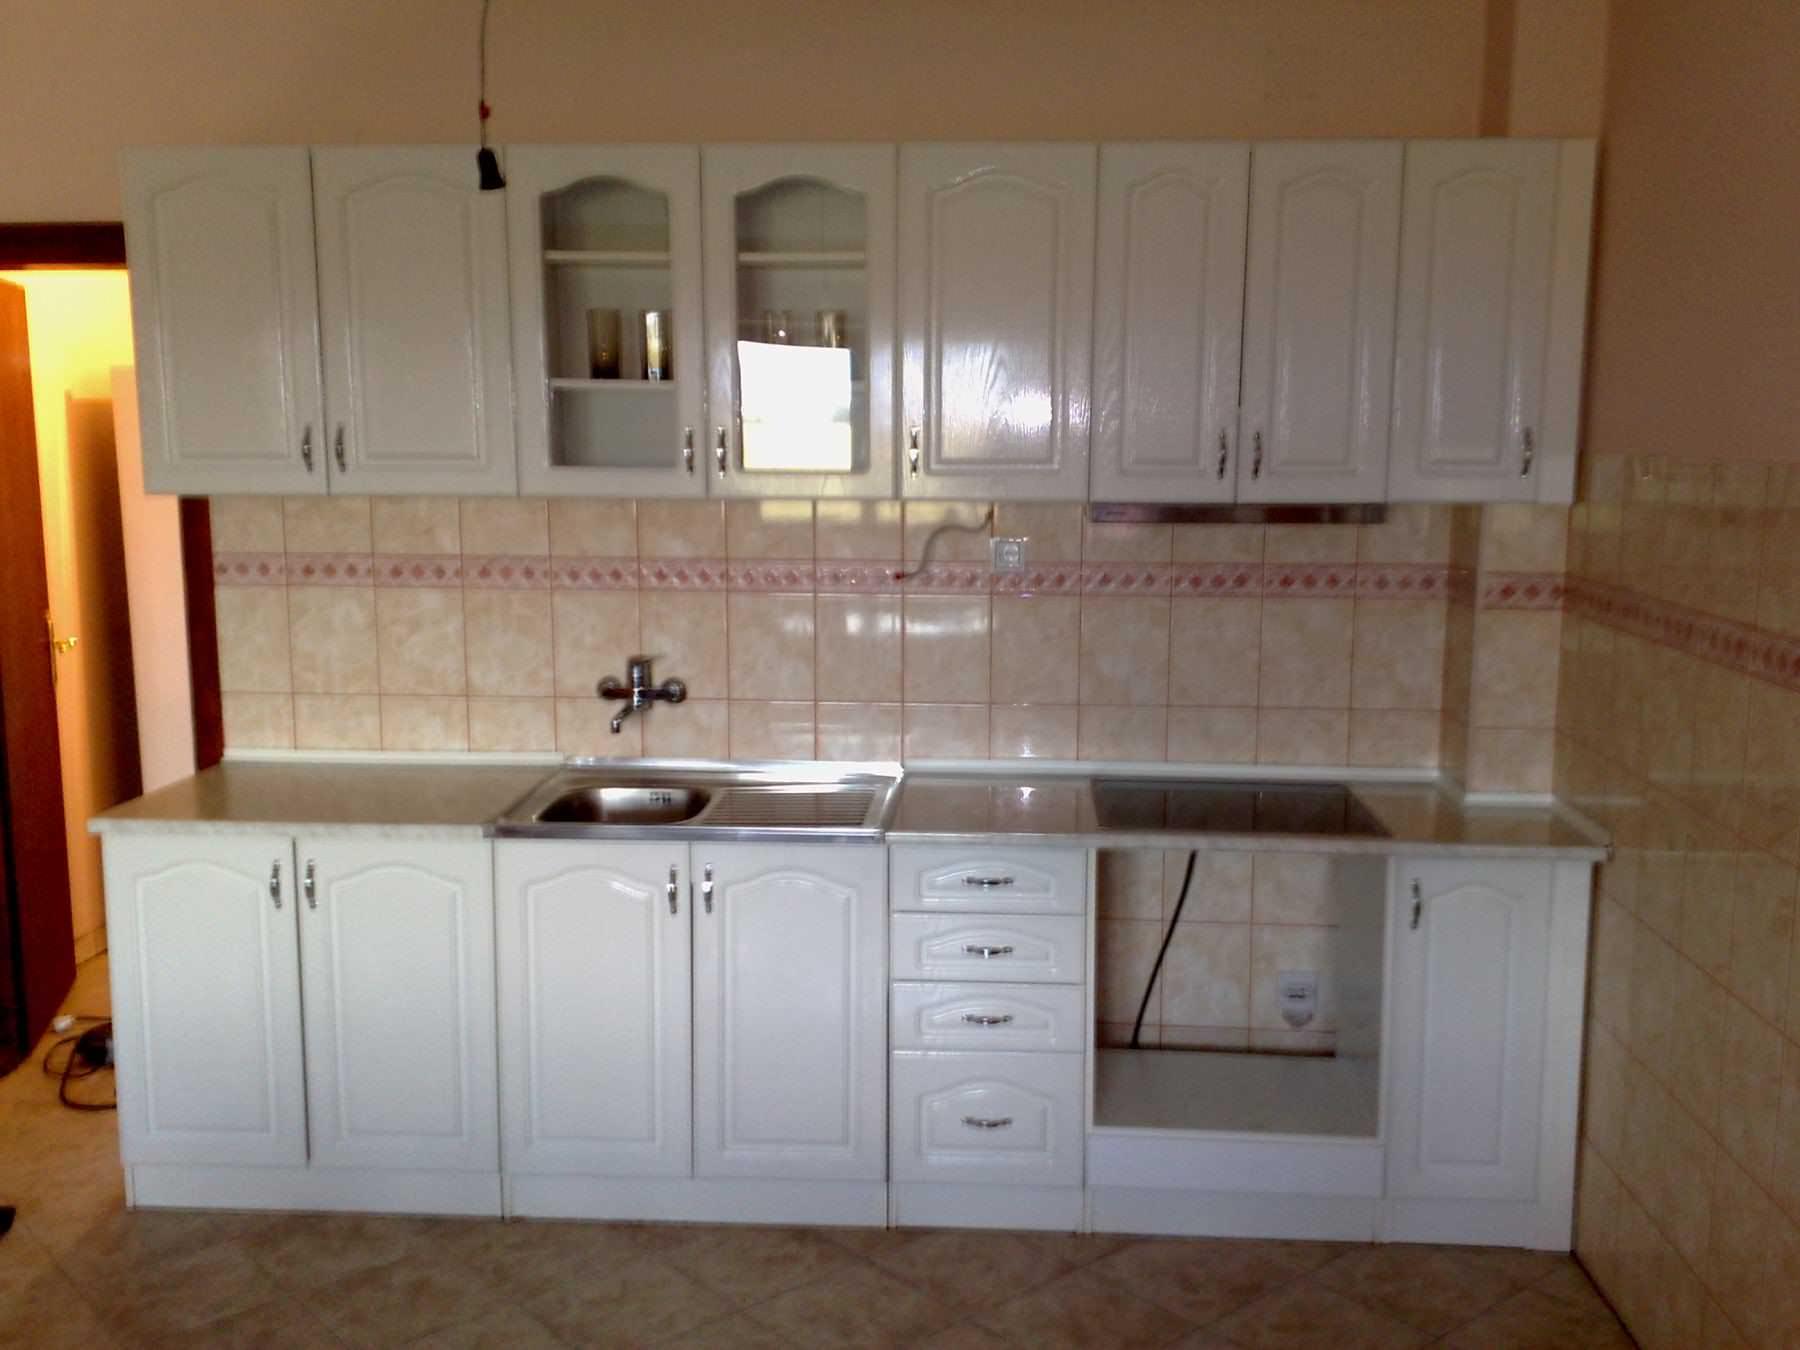 kuhinje po meri od 155e 2 metra 14383557. Black Bedroom Furniture Sets. Home Design Ideas